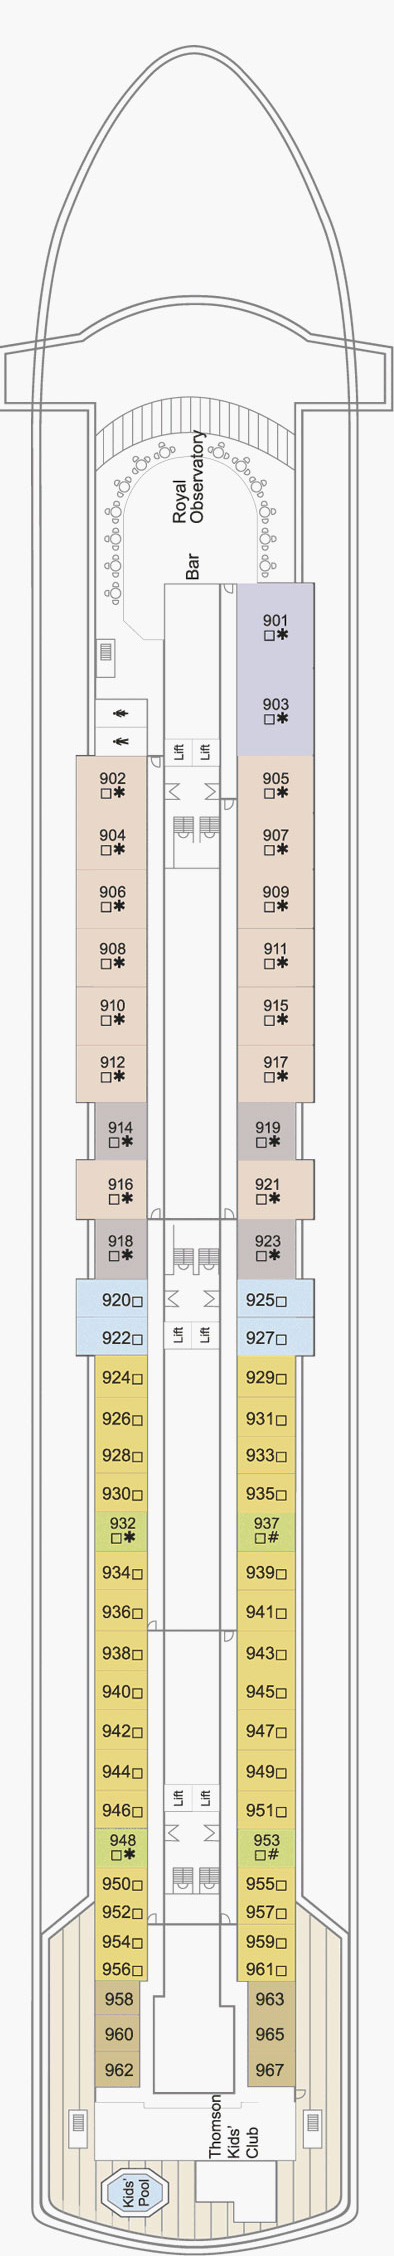 Thomson Majesty Cruise Ship Deck Plan Fitbudha Com